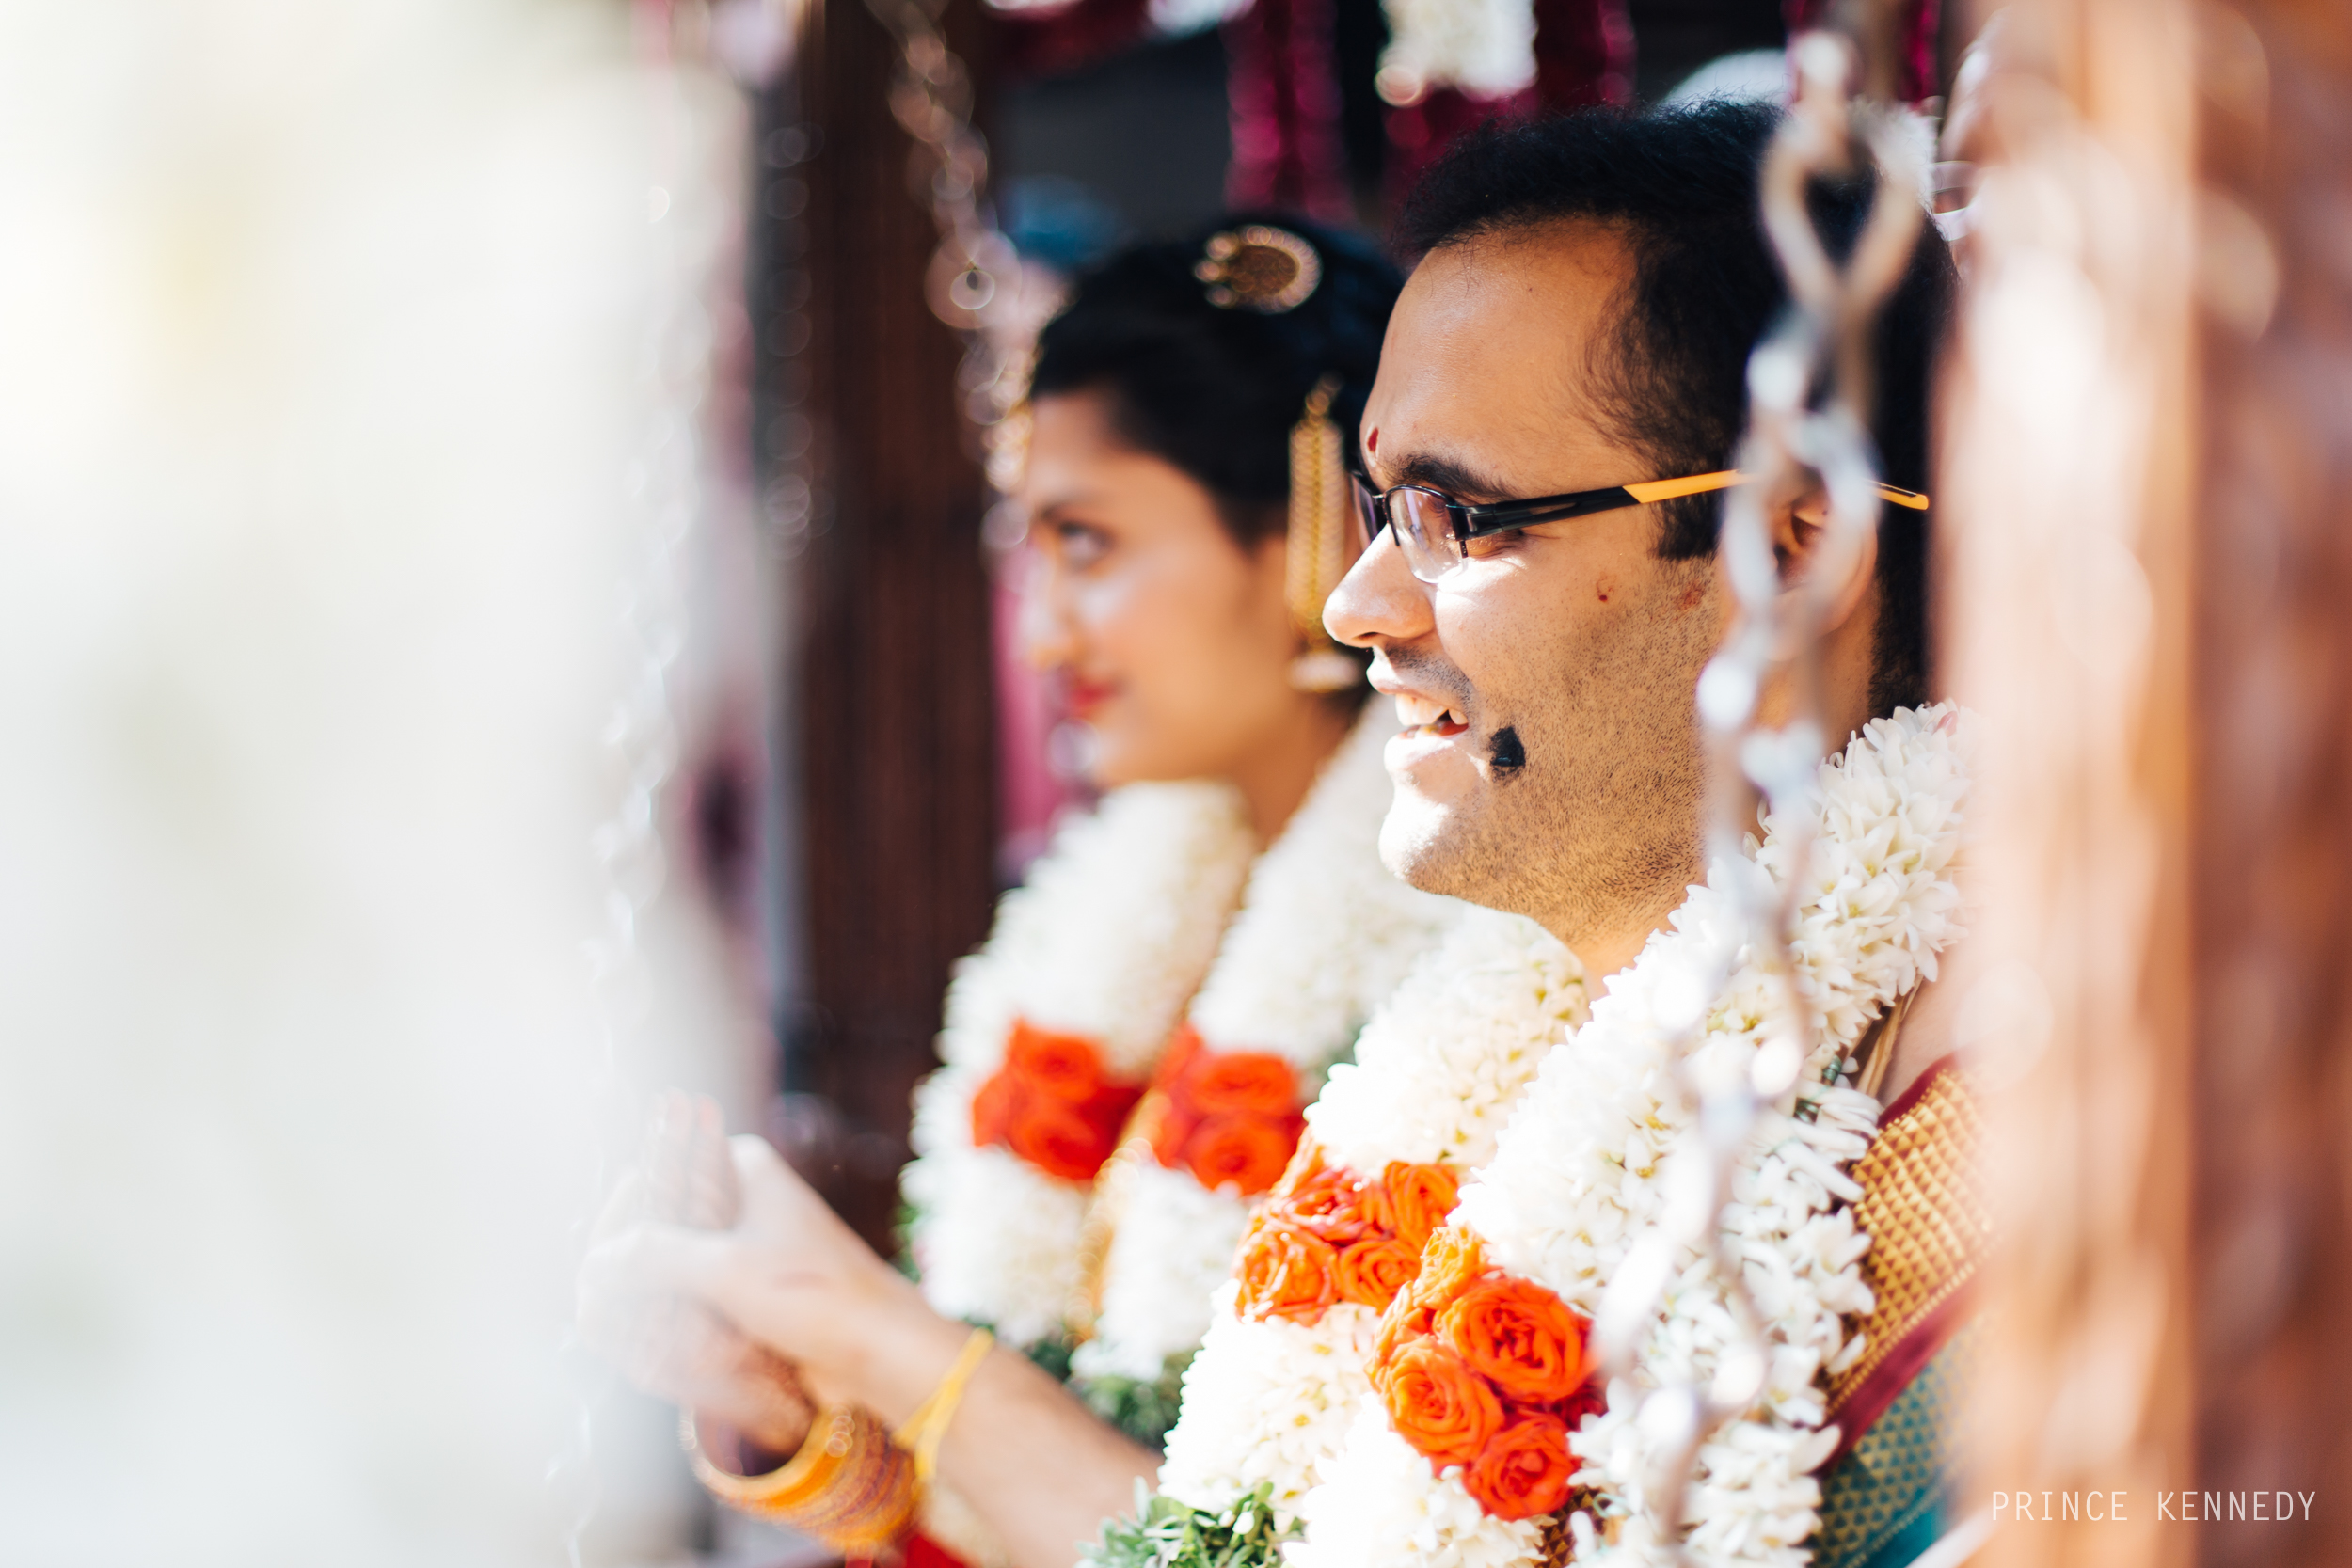 Athmajja-Nithesh-Engagement-Couple-Portrait-Portraiture-Wedding-Couple-Portrait-Chennai-Photographer-Candid-Photography-Destination-Best-Prince-Kennedy-Photography-108.jpg